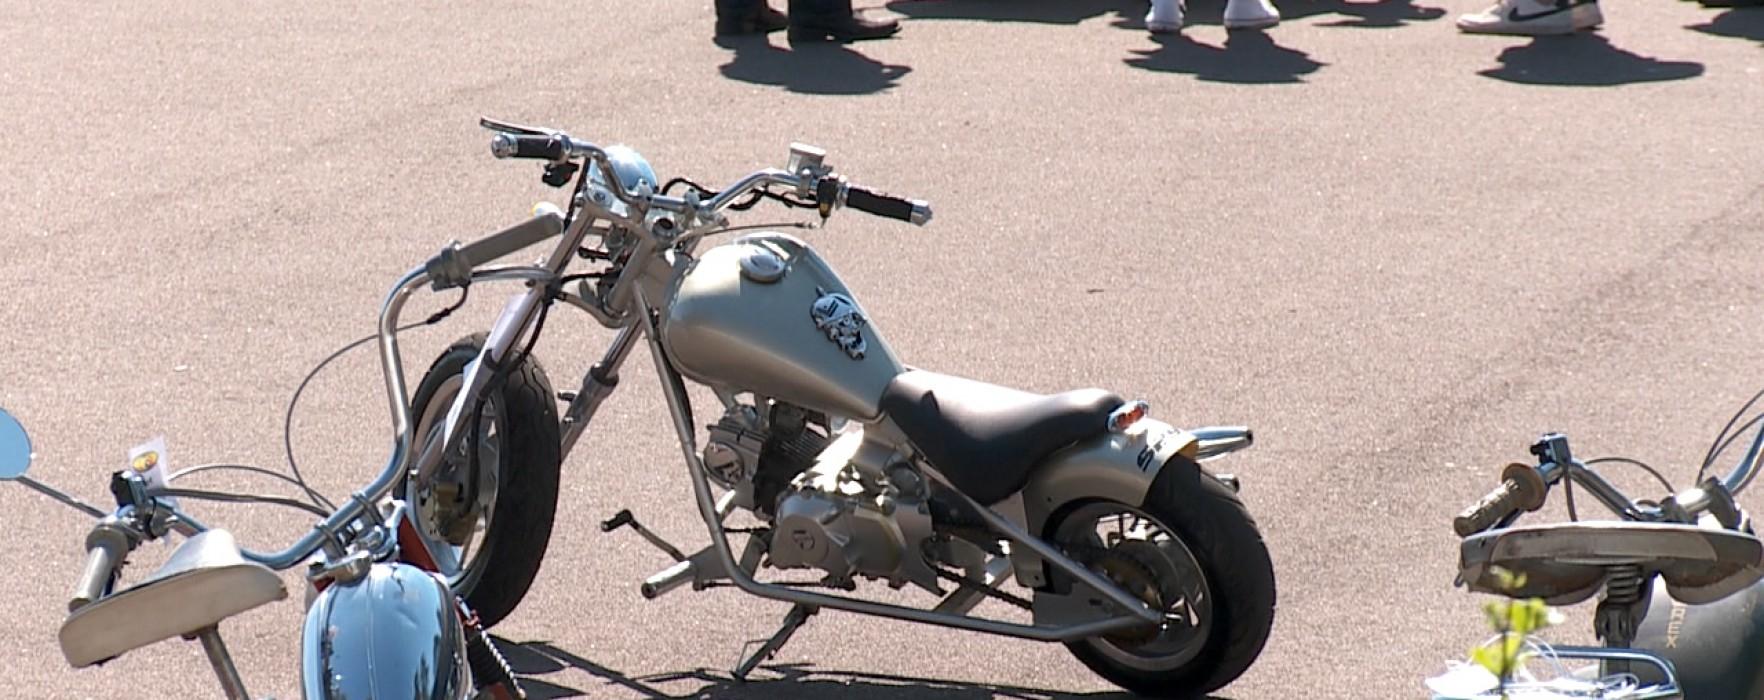 Edsvalla motordag